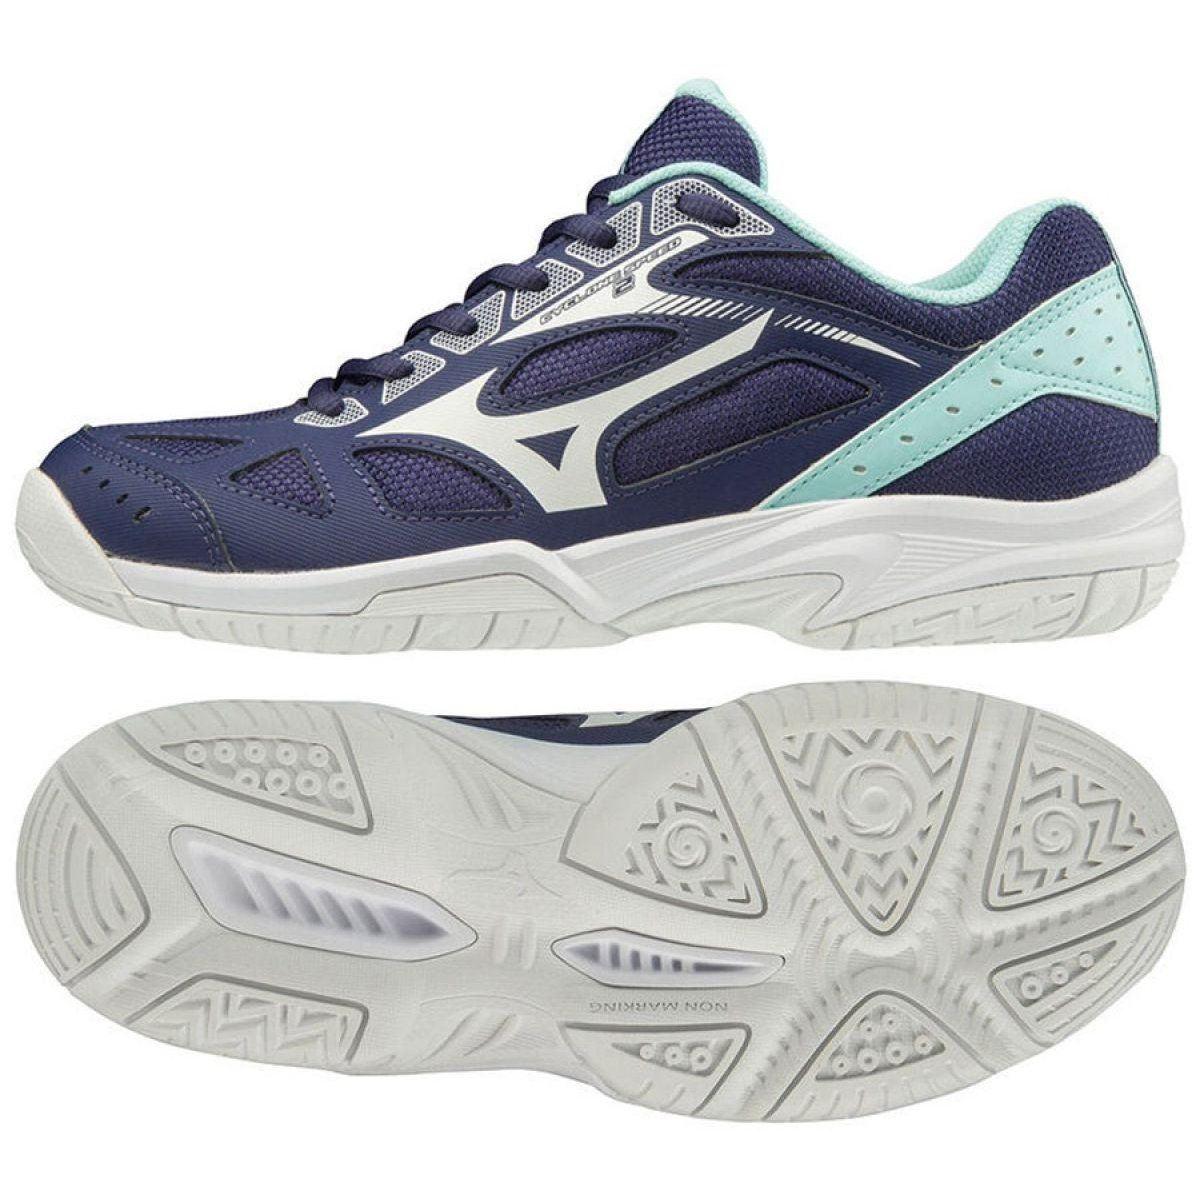 Mizuno Buty Miznuno Cyclone Speed 2 W V1gc198015 Granatowe Granatowe Volleyball Shoes Running Shoes For Men Mizuno Shoes